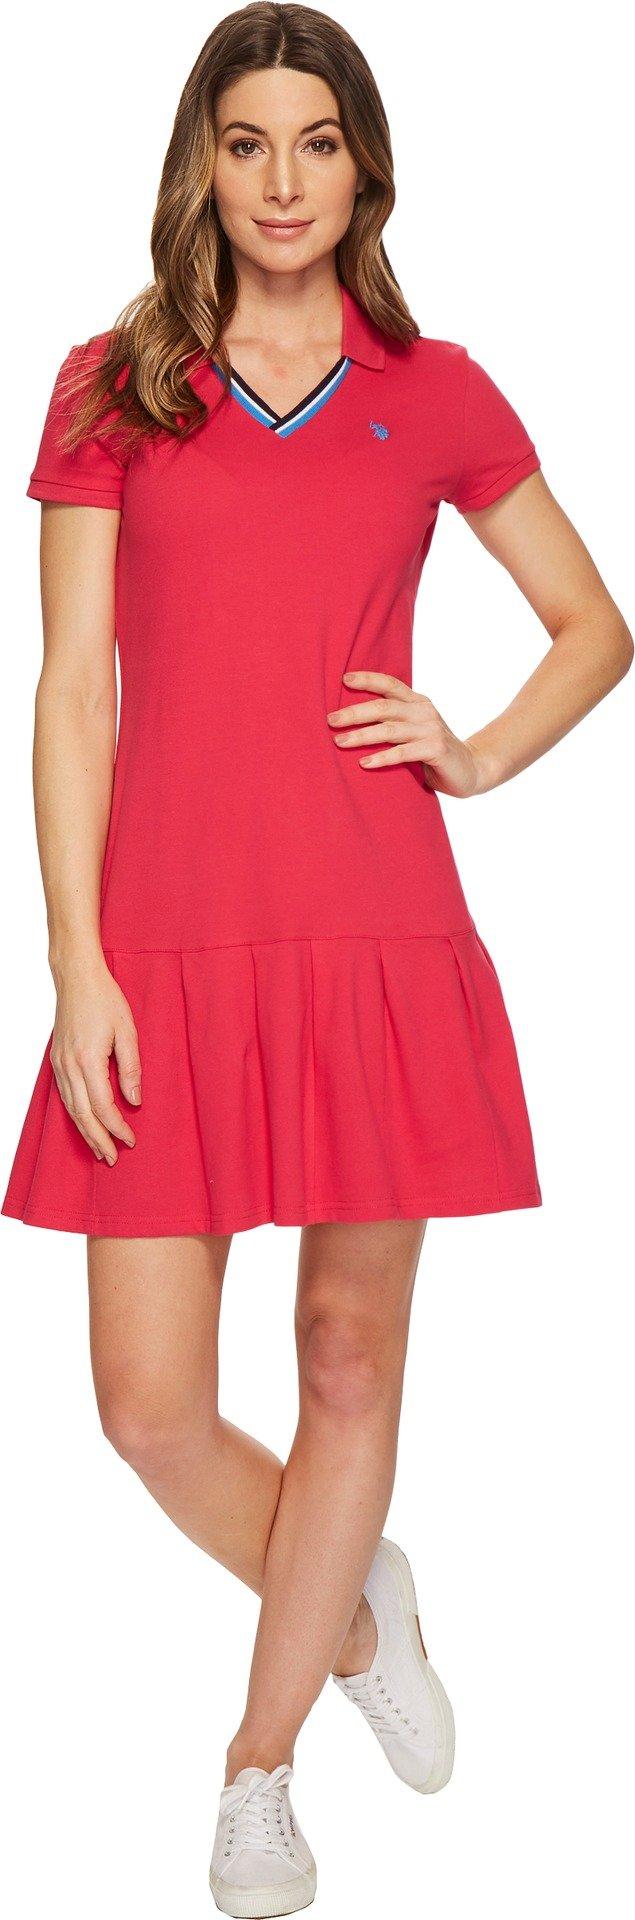 U.S. Polo Assn.. Women's Polo Dress, Bright Rose, L